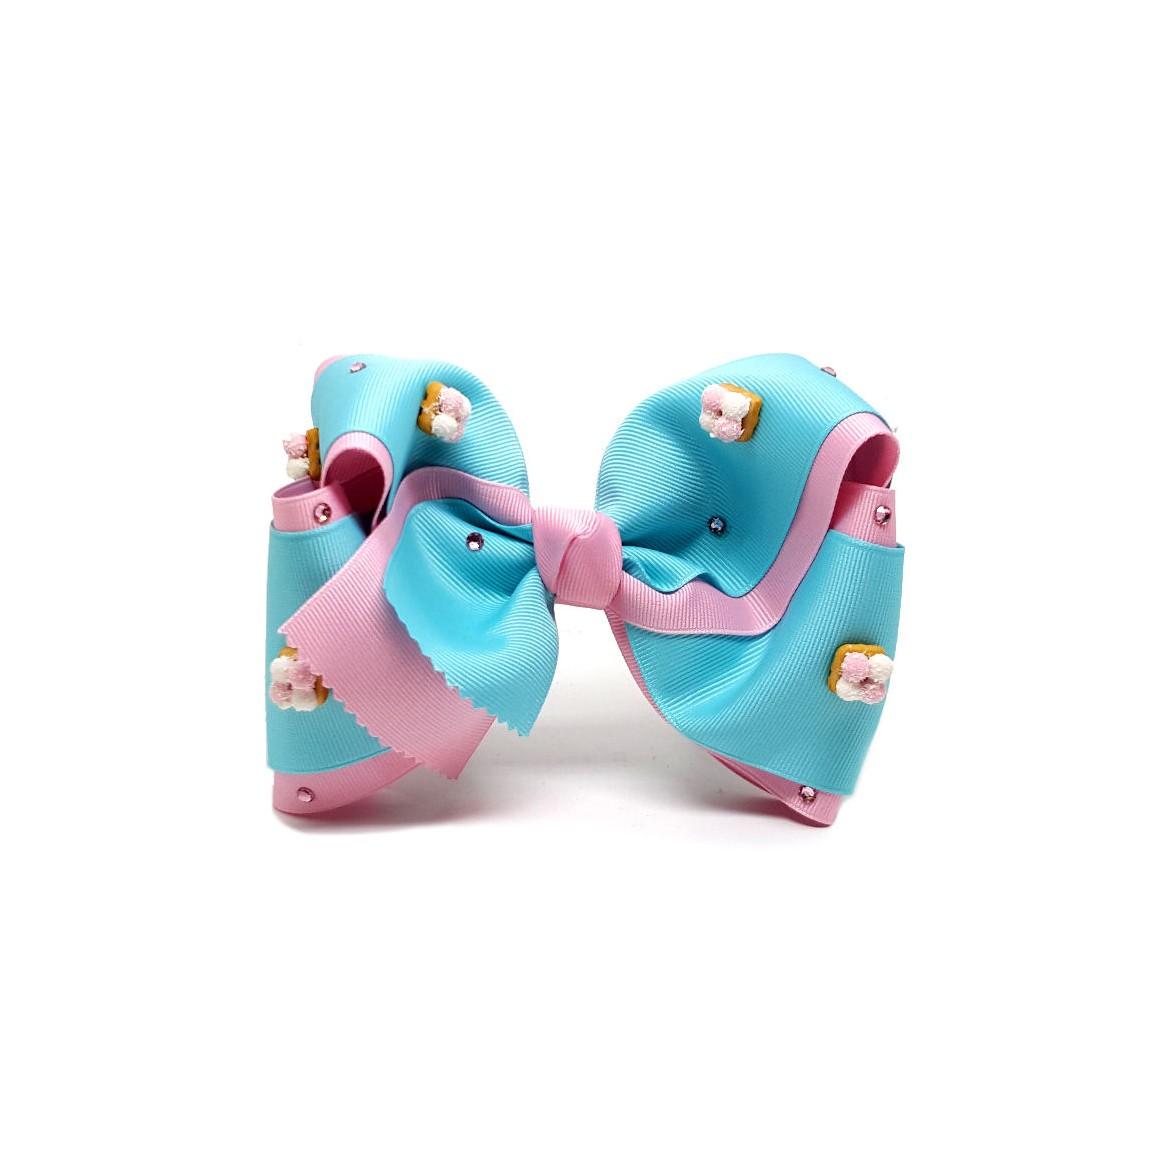 Yomi Yomis Bow Marshmallow Cookies Mini Double Old Pink And Aqua